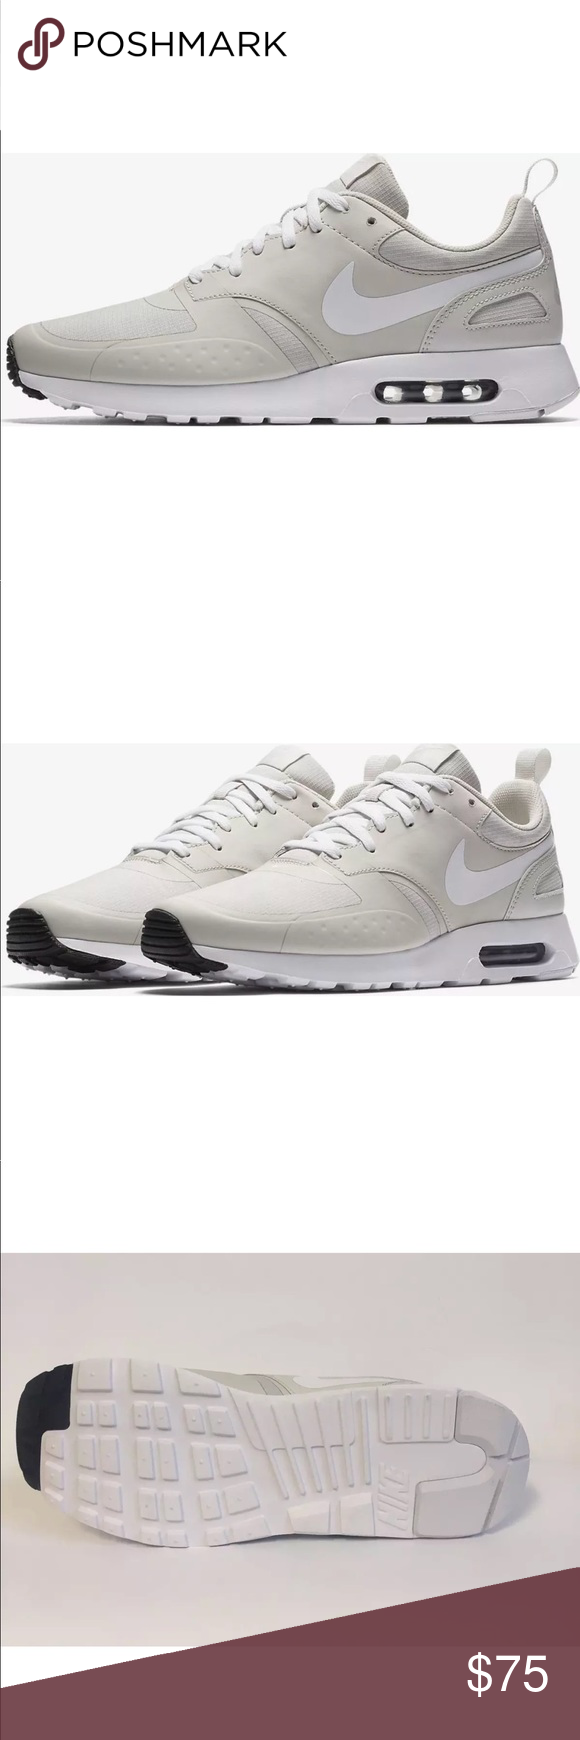 Nike Air Max Vision Casual Schuhe für Herren Neue Kollektion